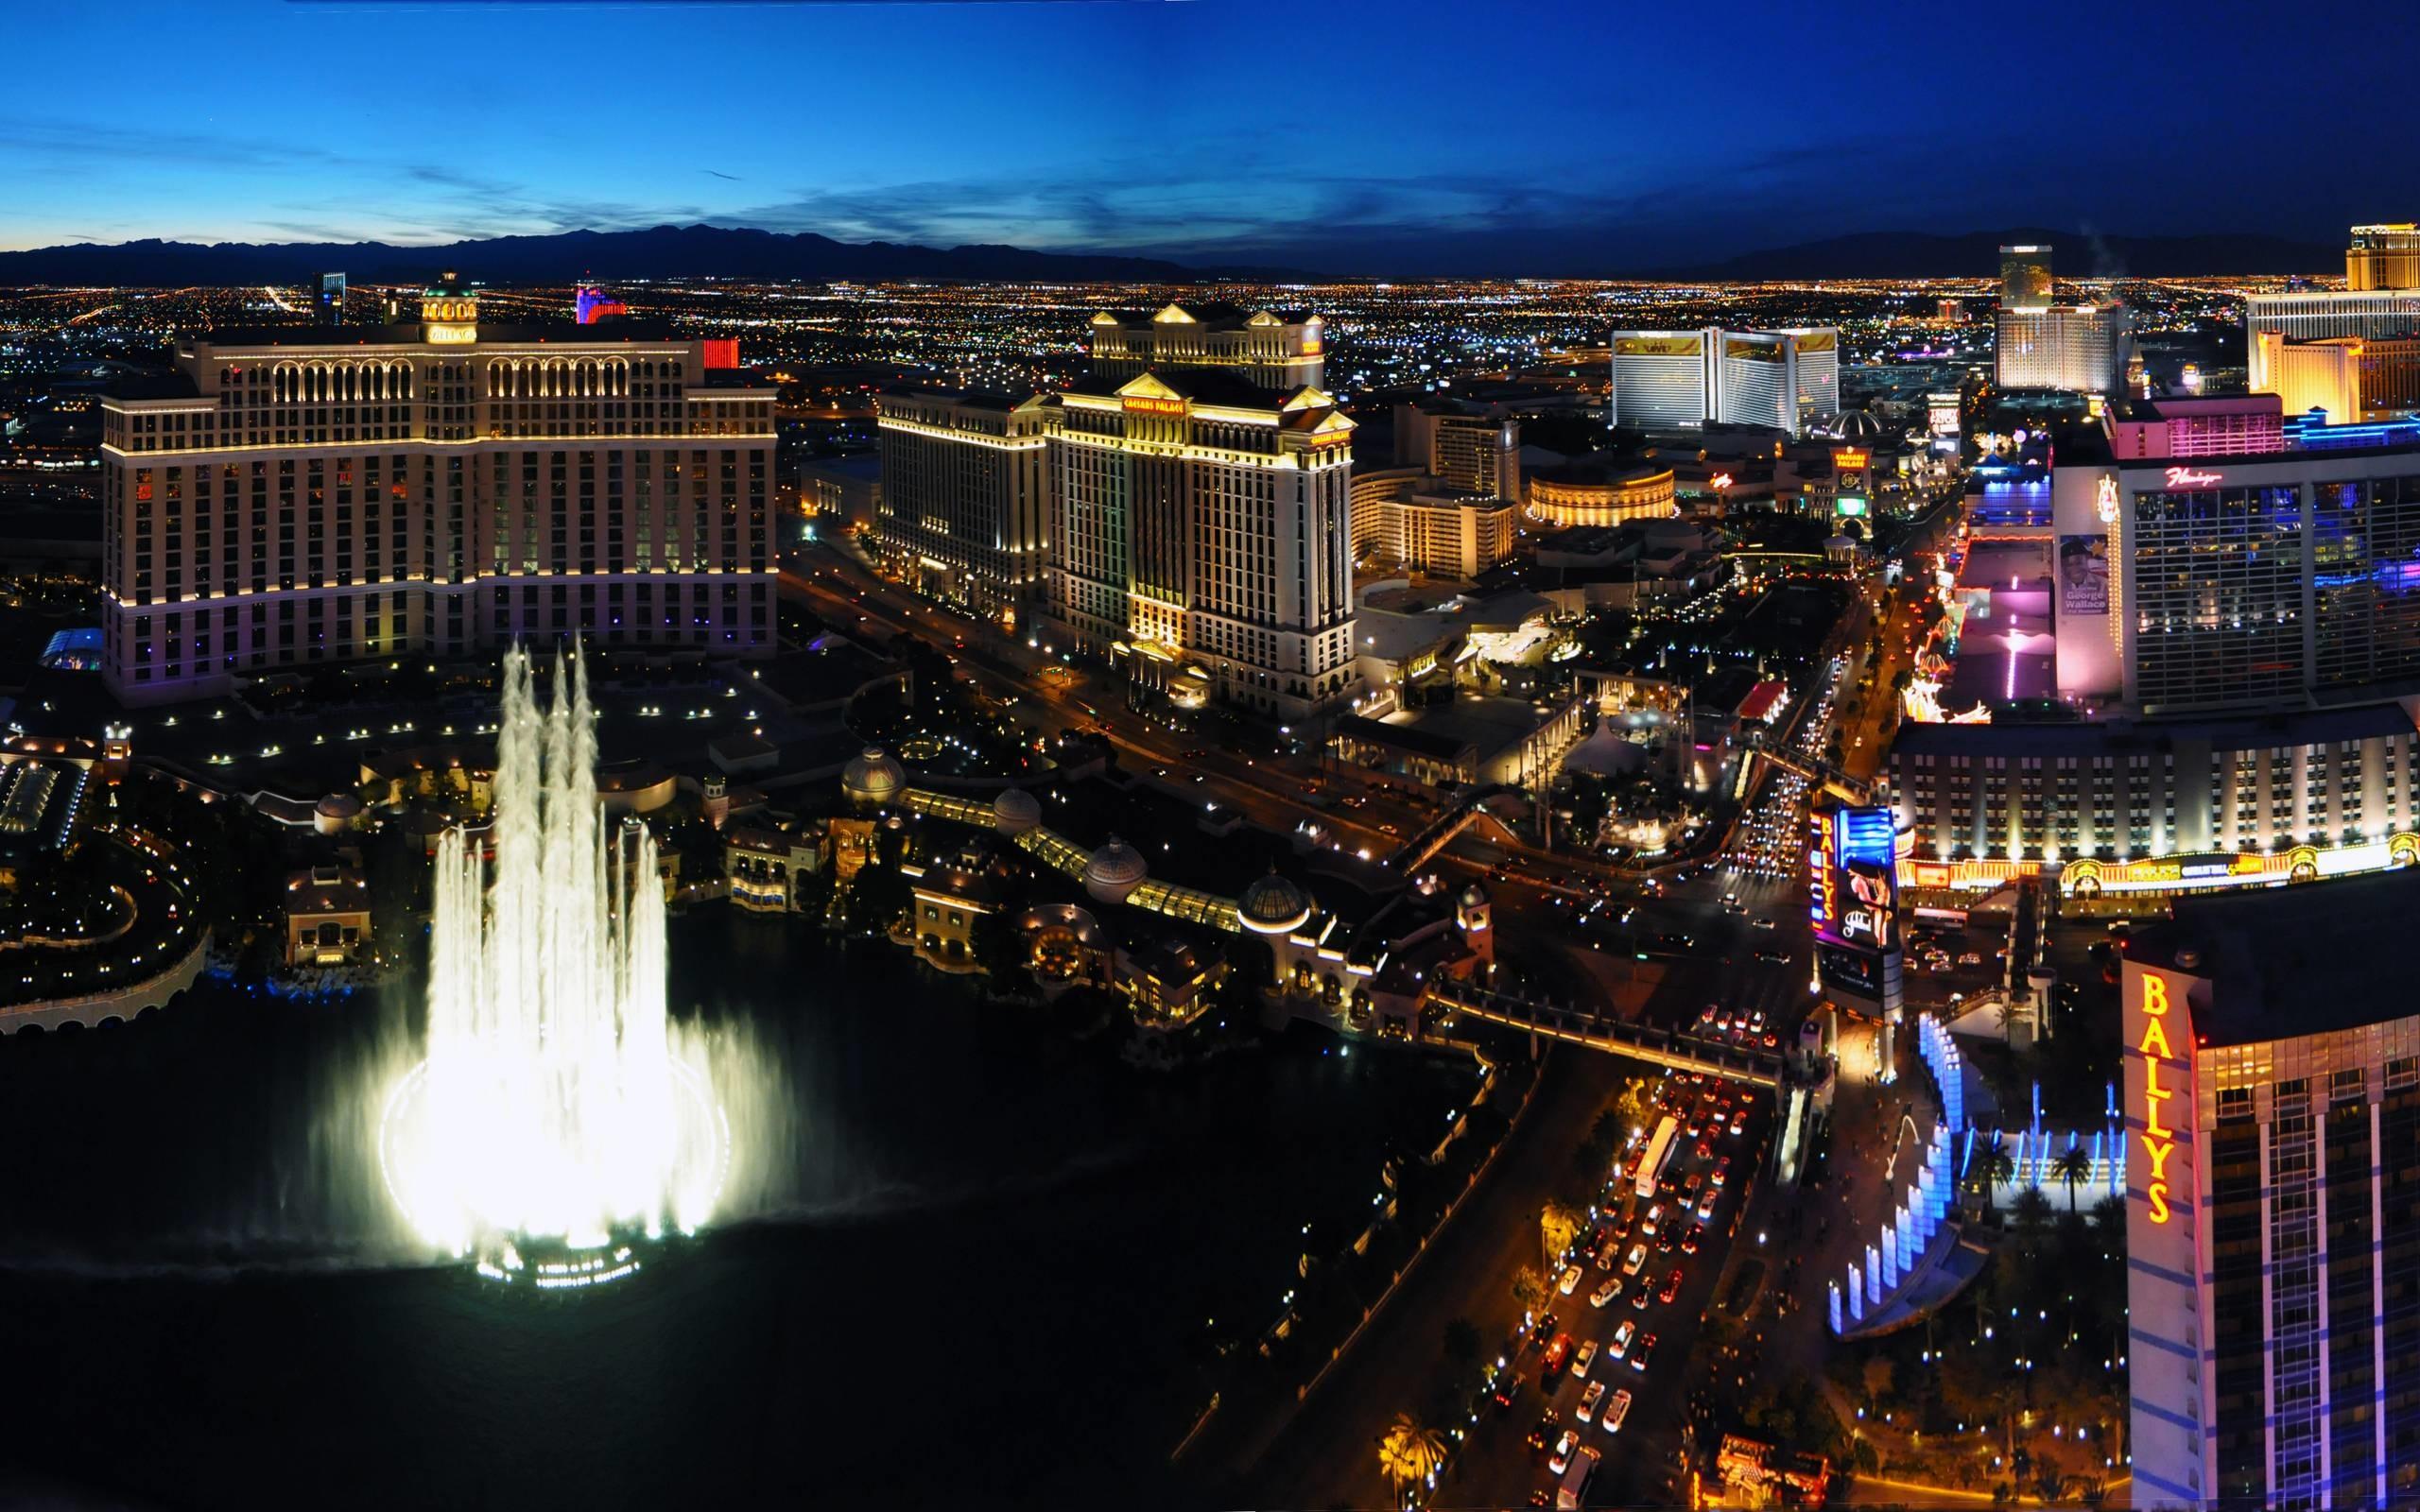 Las Vegas HD Wallpaper 80 pictures 2560x1600